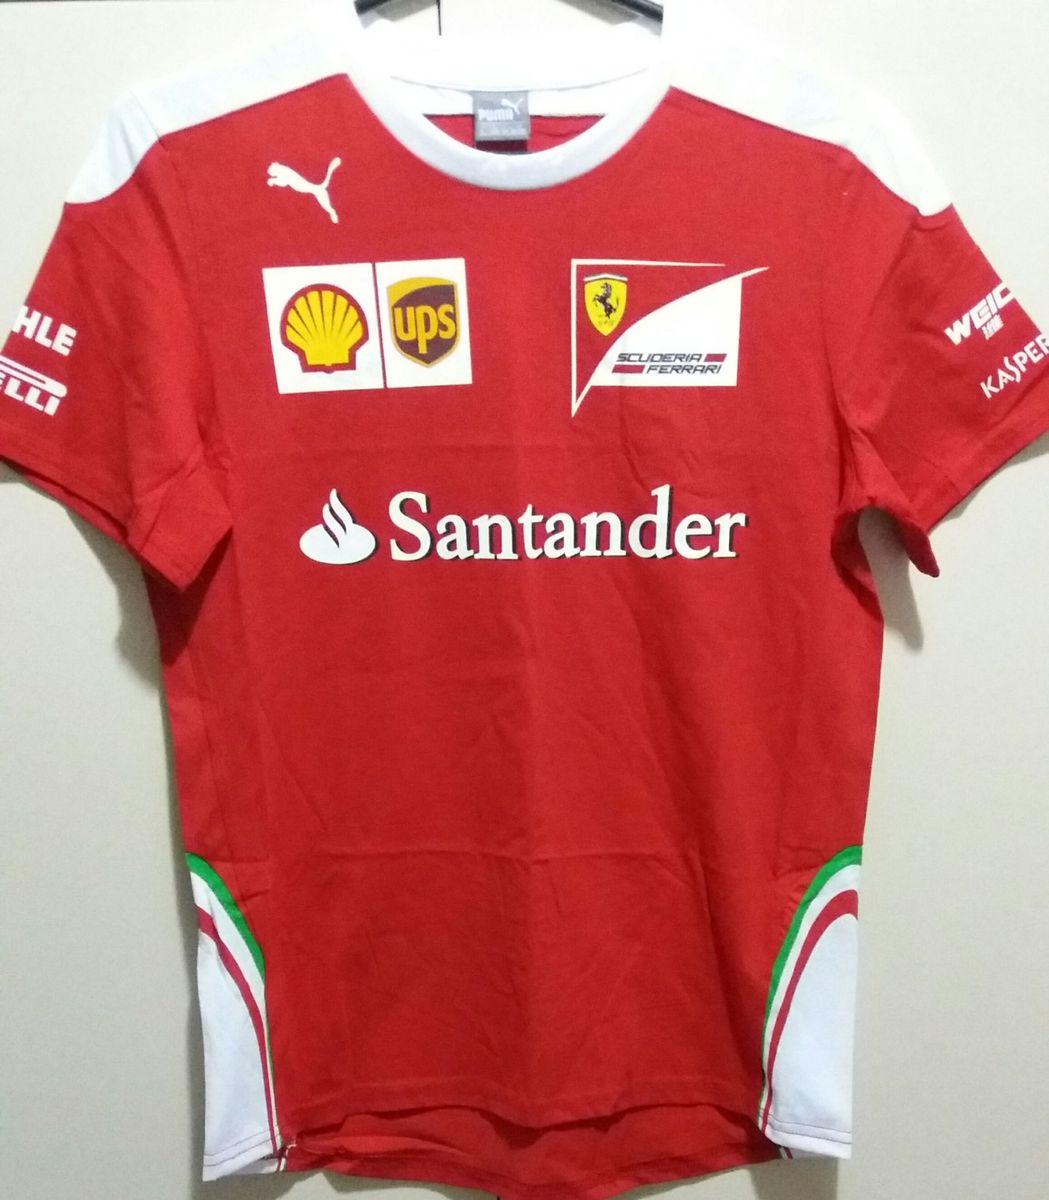 camiseta ferrari junior - menino ferrari.  Czm6ly9wag90b3muzw5qb2vplmnvbs5ici9wcm9kdwn0cy80mjkyntavztg4mtlhzwfmmdk5m2u3ngzkotc3zjviywvmywe2ogquanbn  ... 92baf498b27